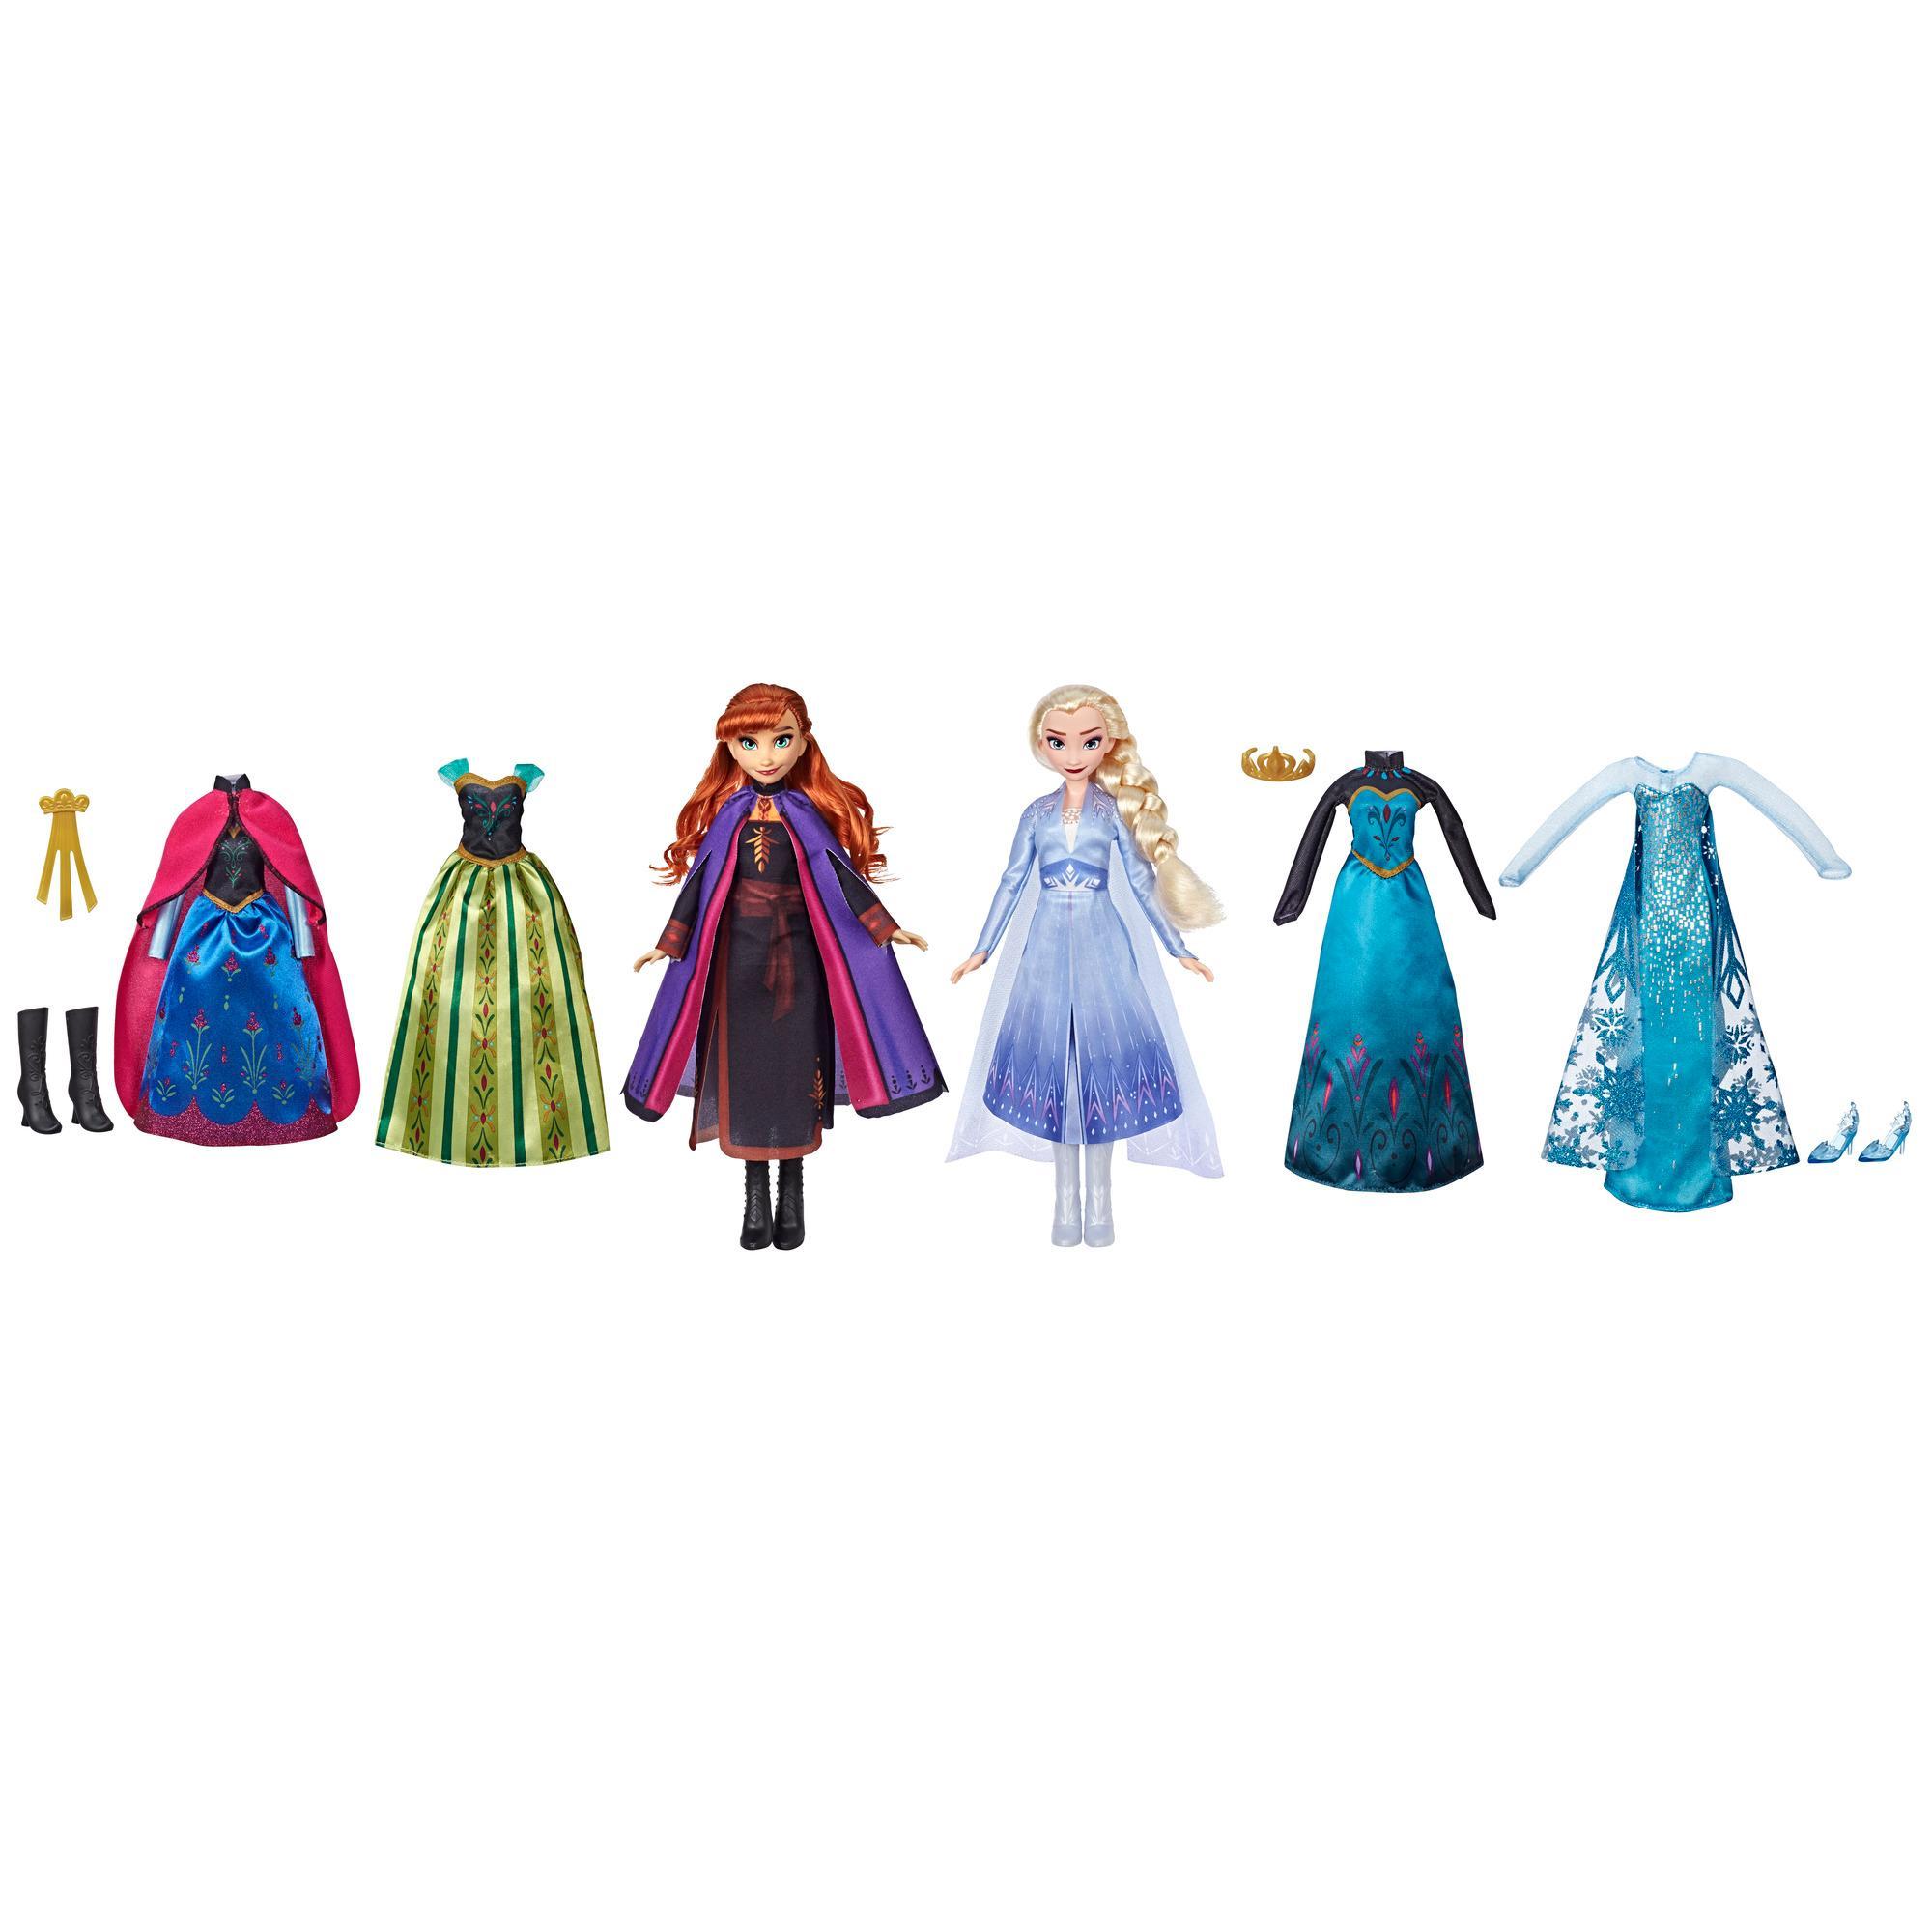 Disney Frozen 2 Elsa ve Anna Büyük Moda Seti